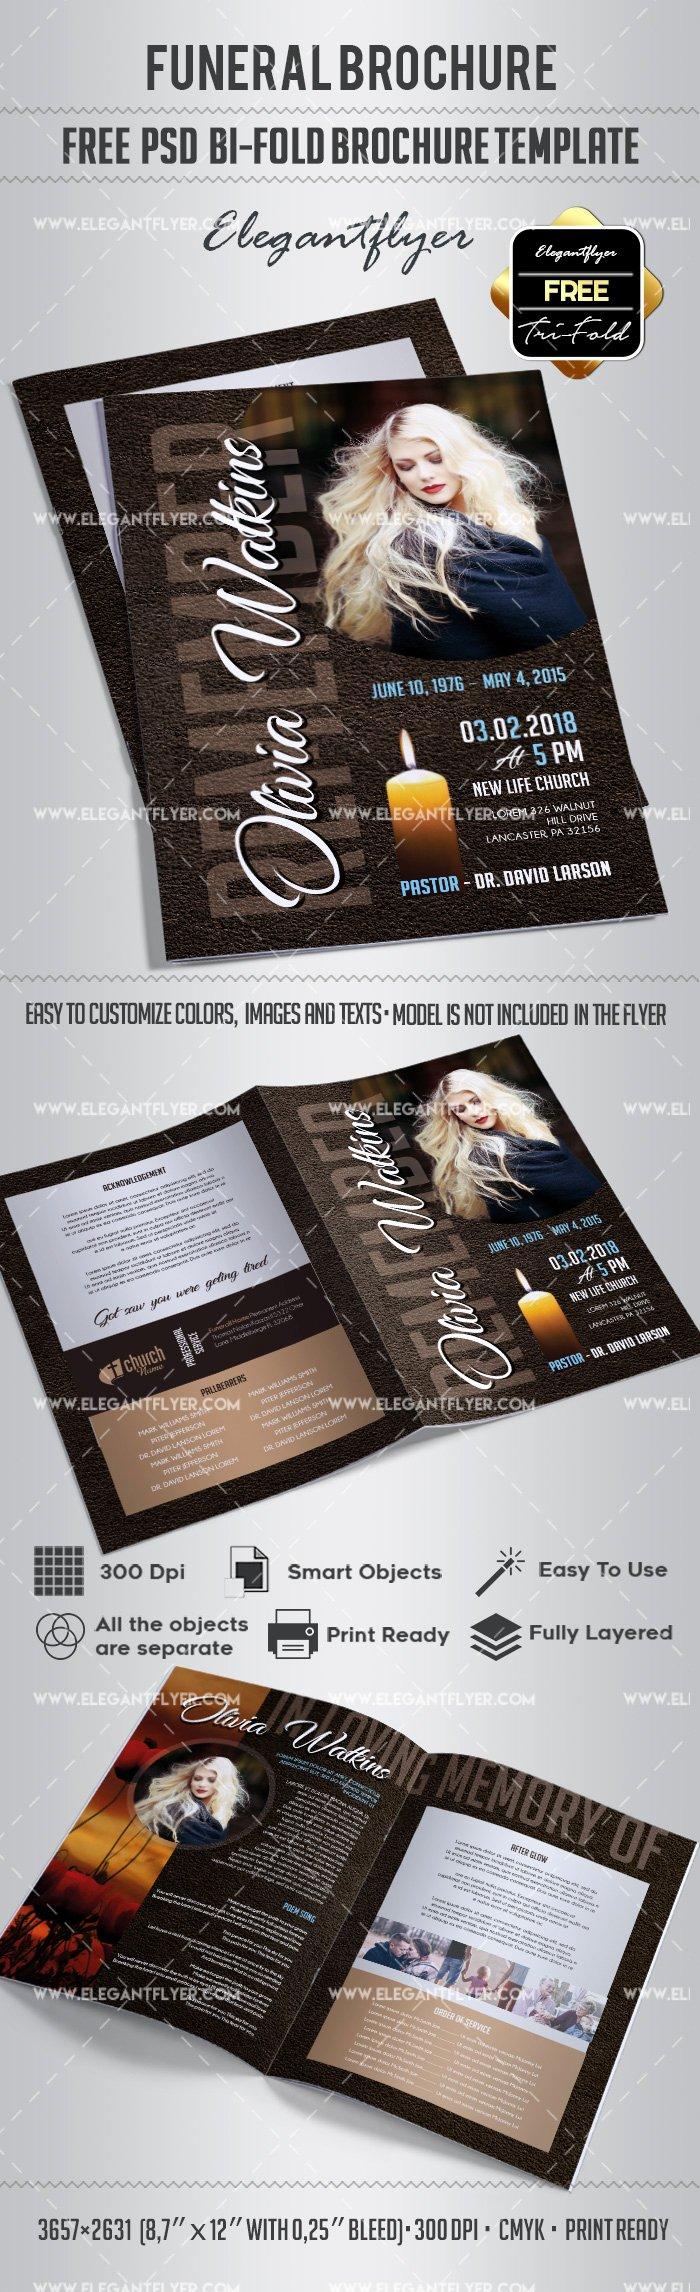 Memorial Pamphlet Template Free Inspirational Free Bi Fold Brochure for Funeral – by Elegantflyer